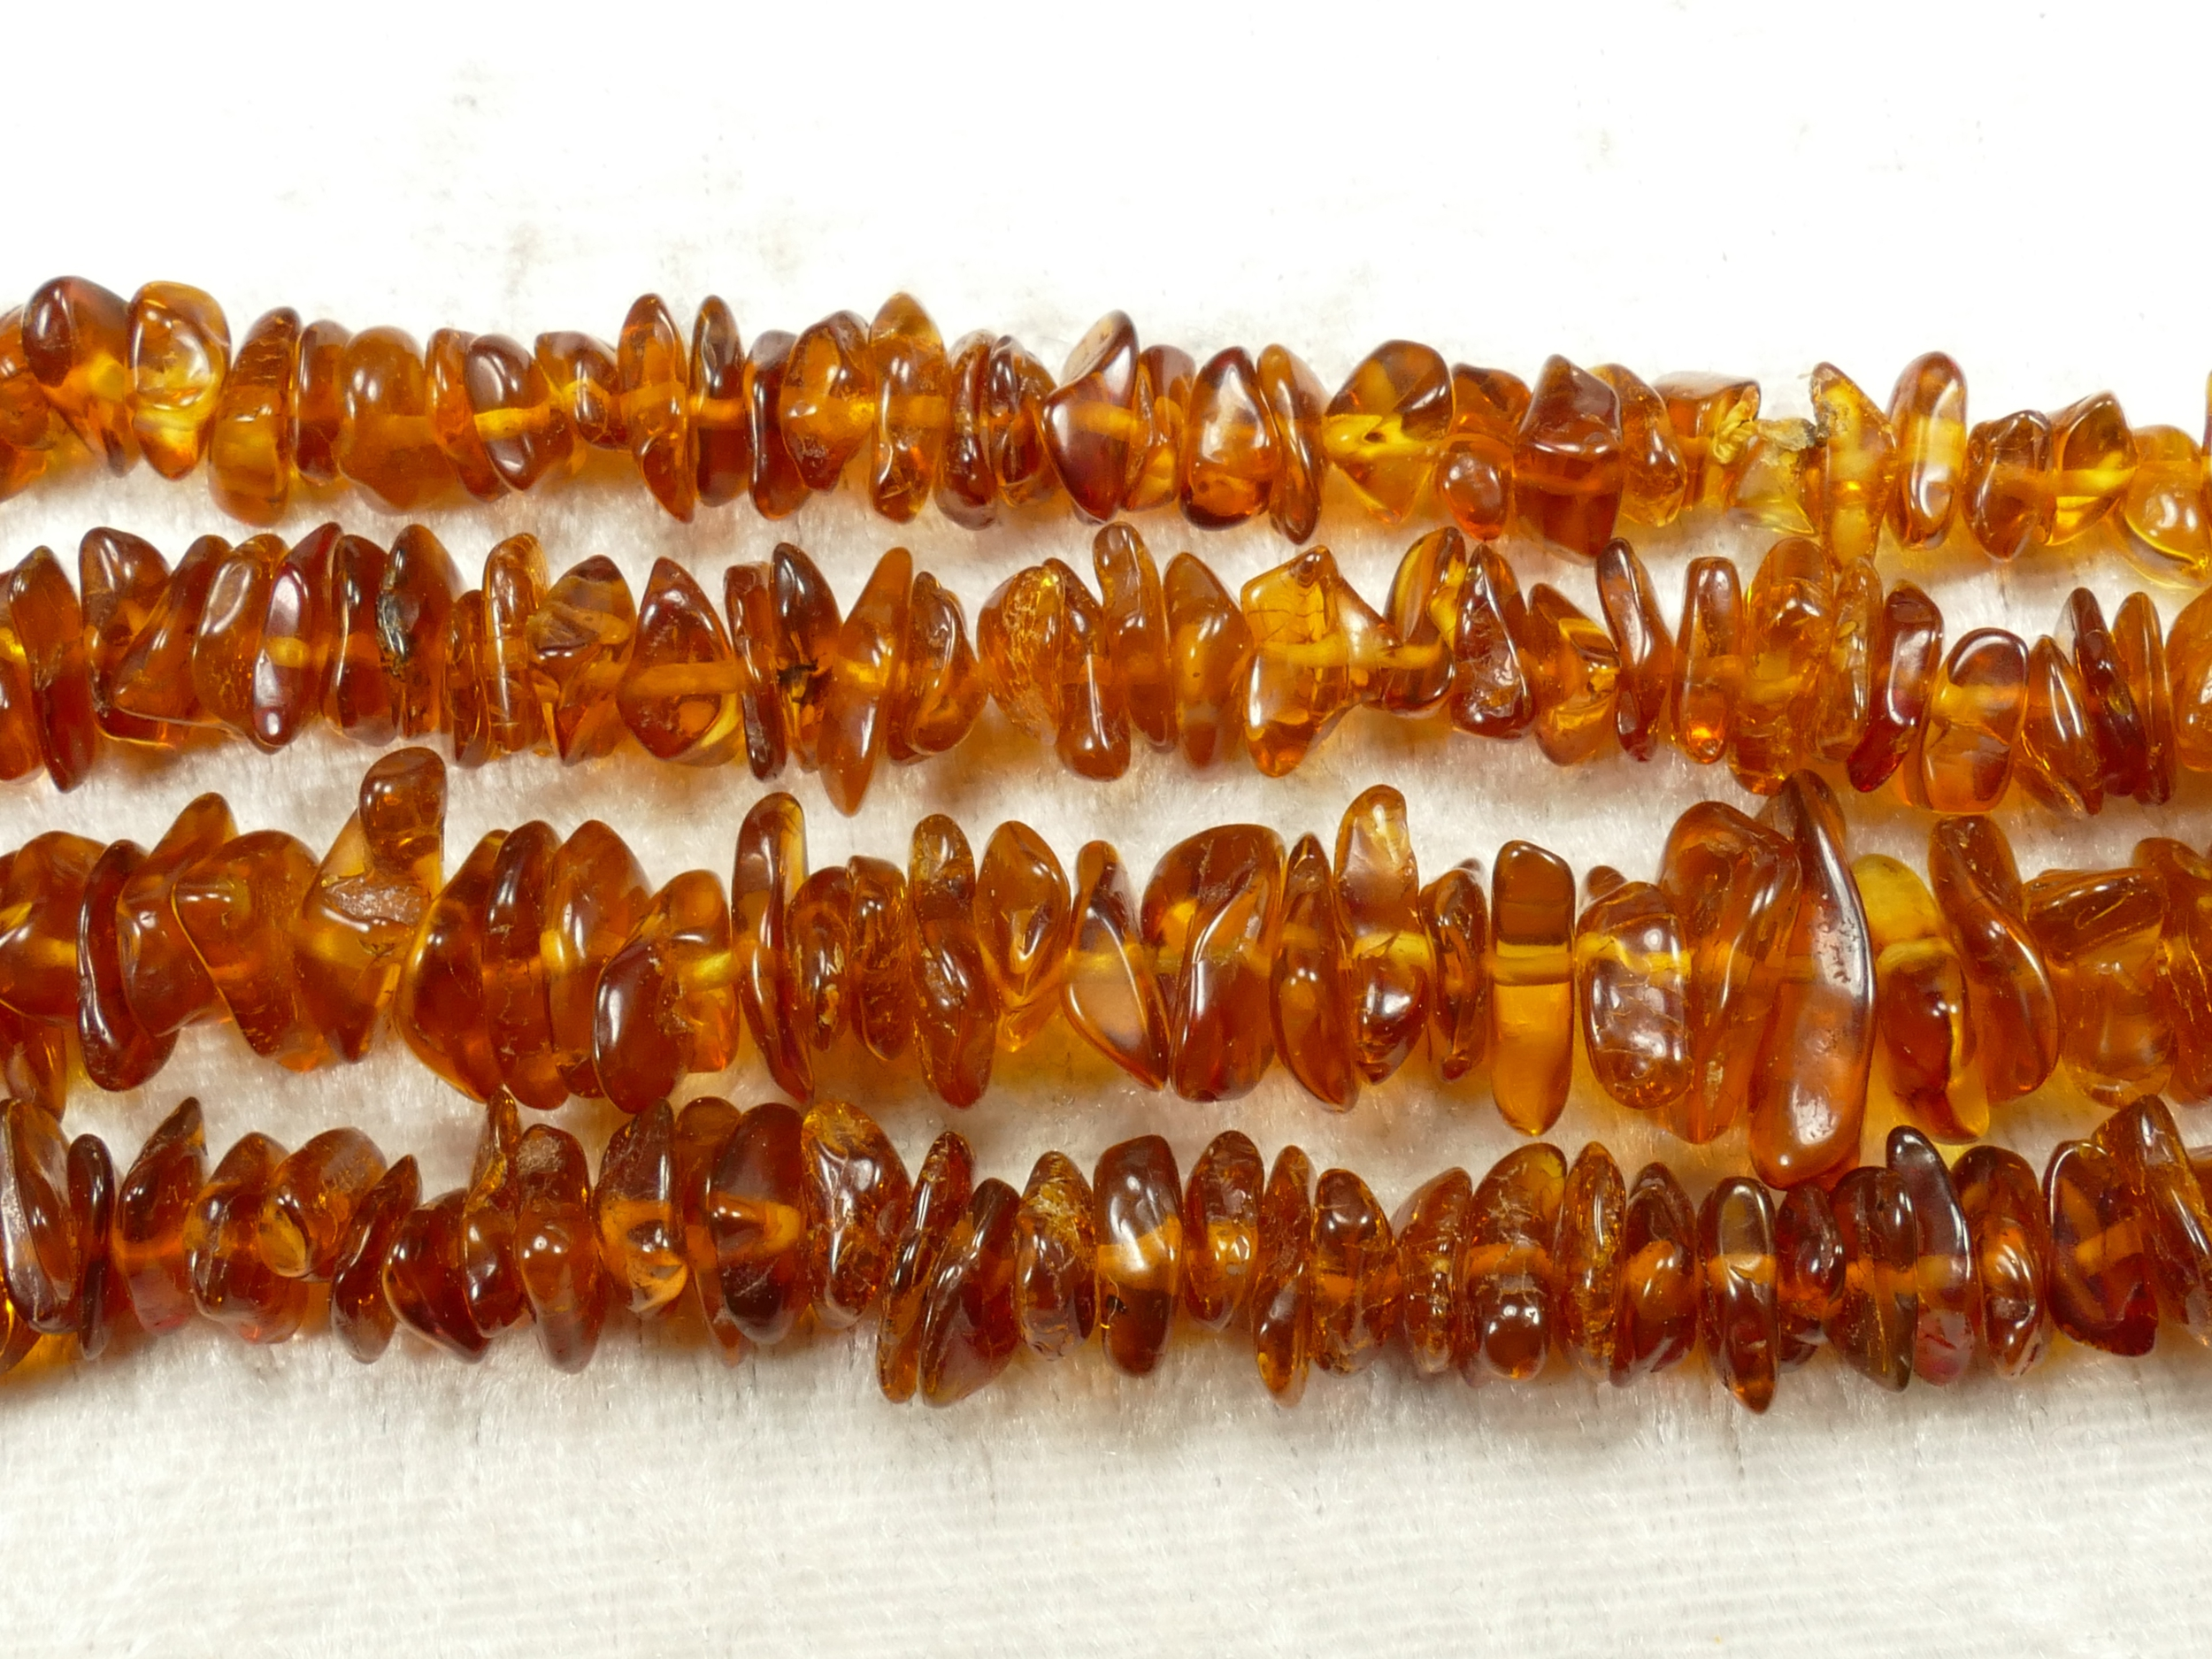 7/11mm Perles d\'Ambre naturel natif de la Mer Baltique roulé x40cm (15.7inch) cognac (#AC633B)